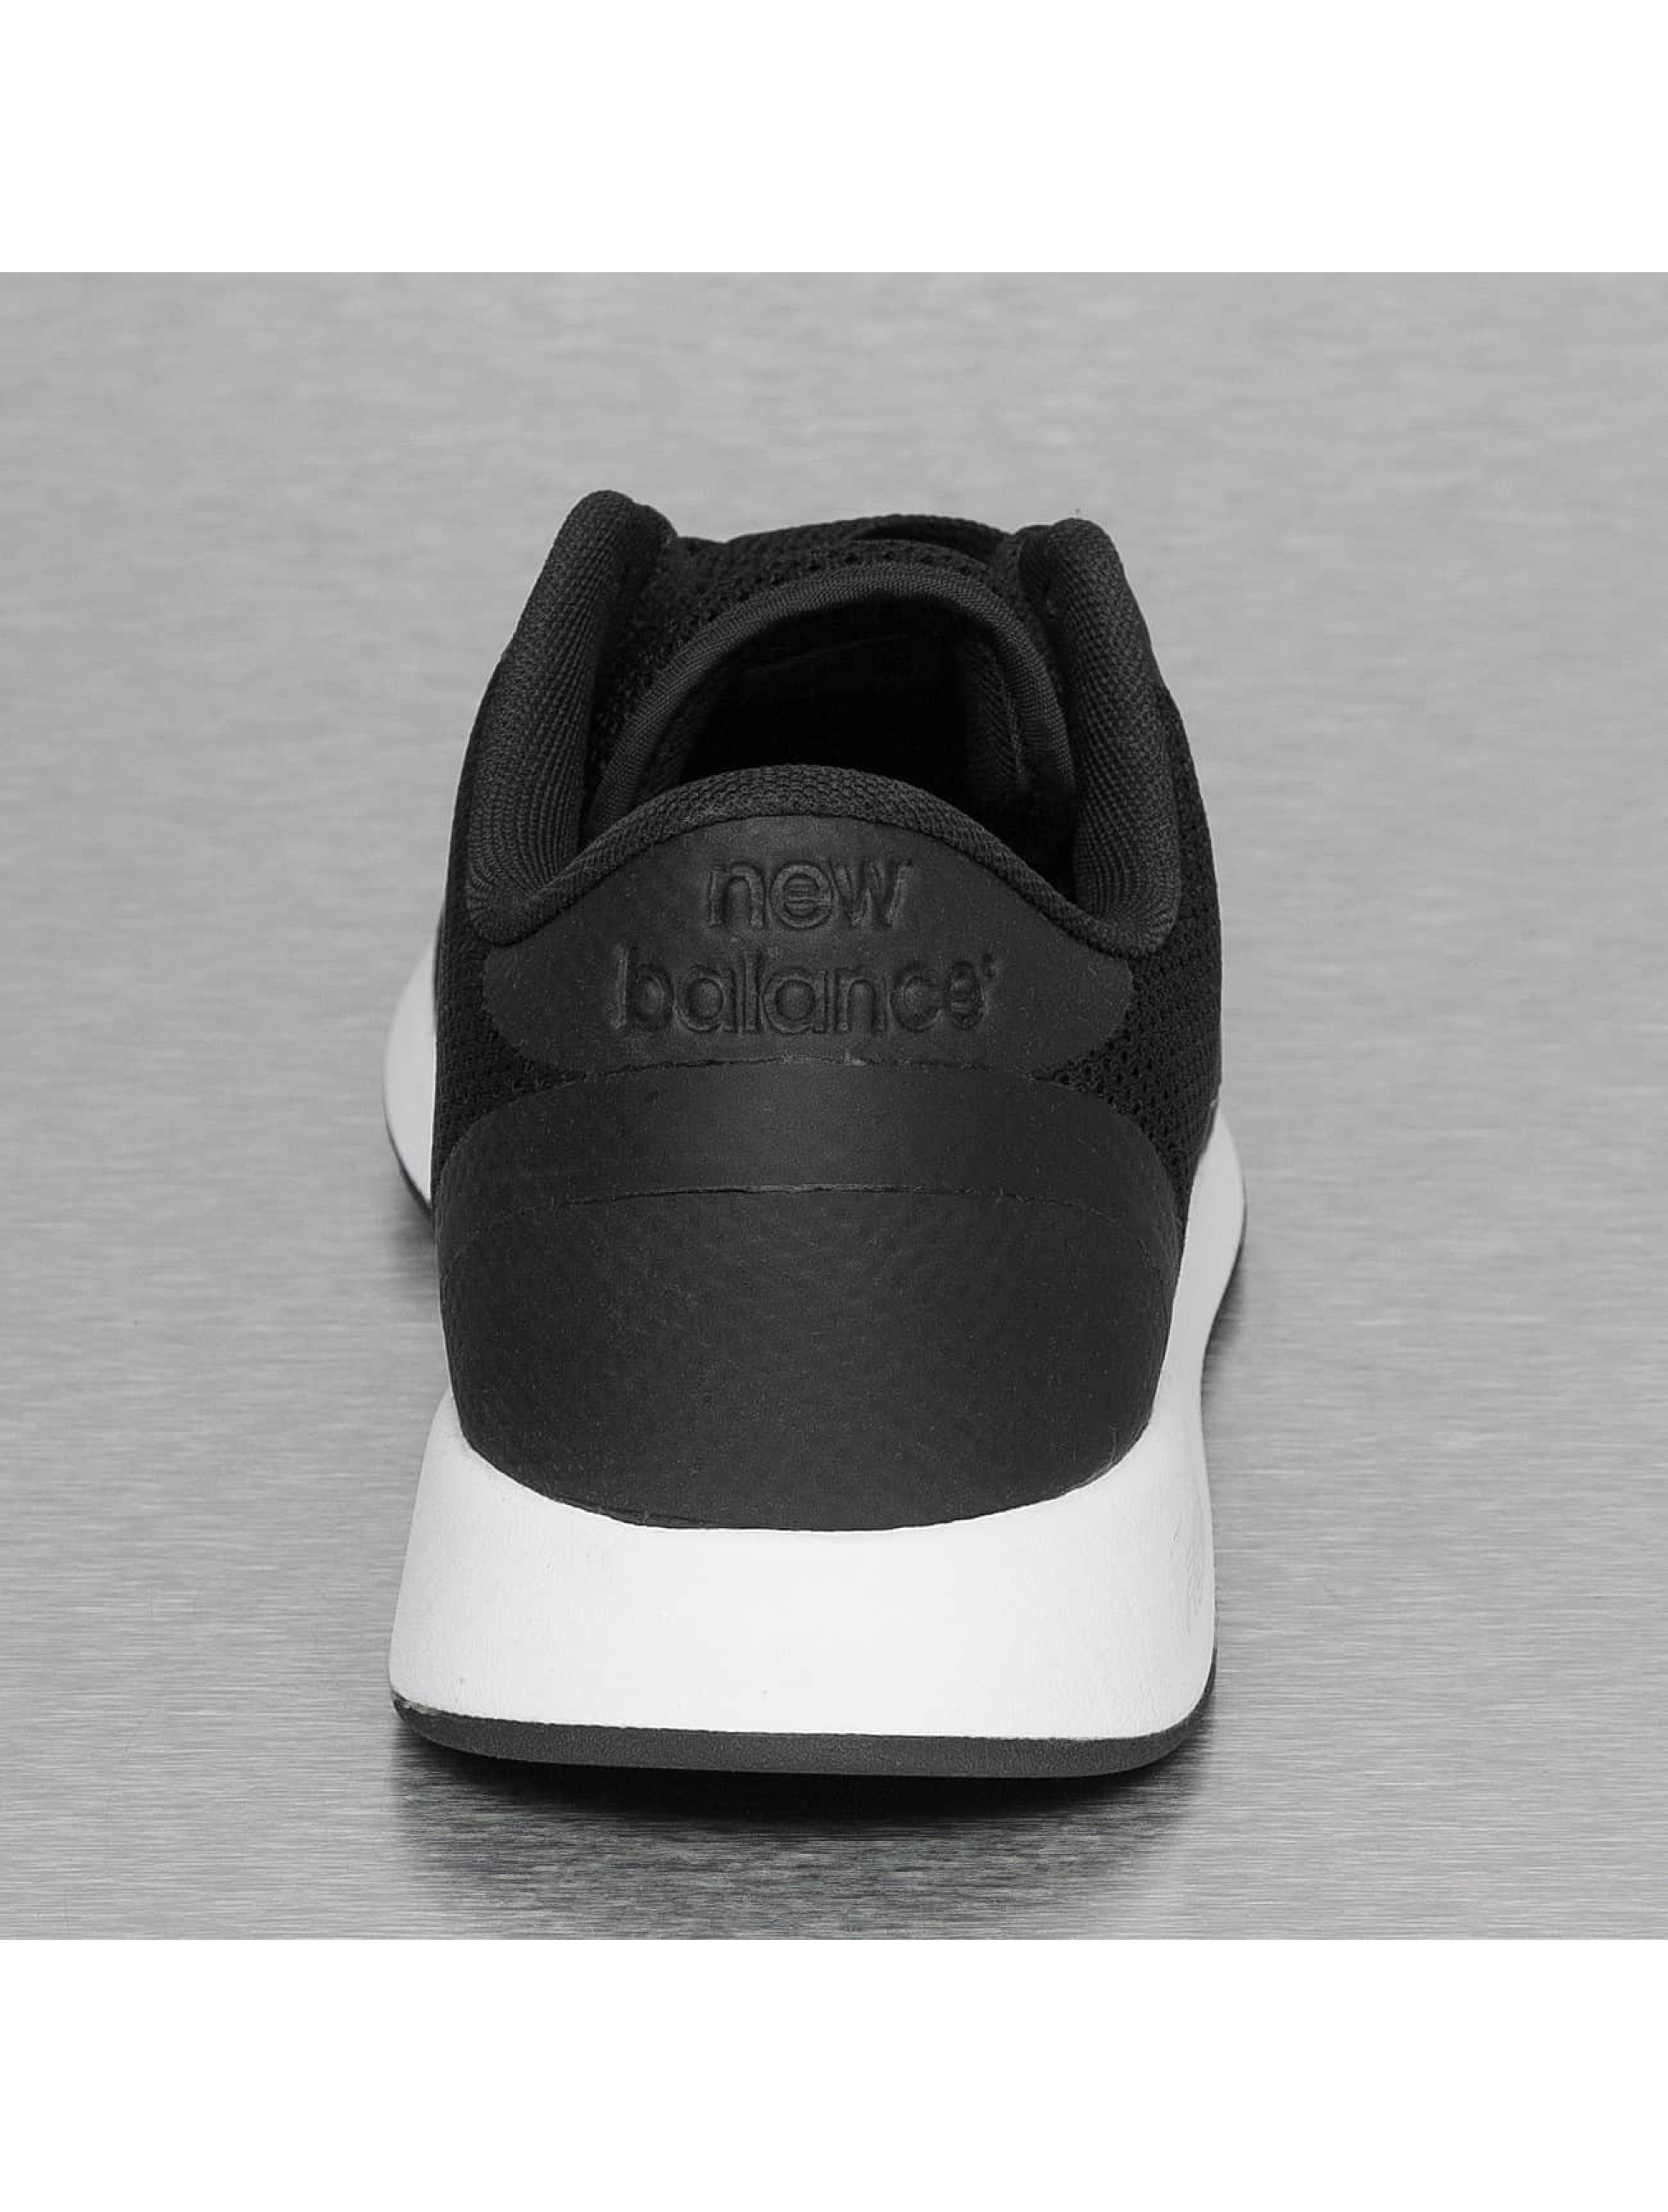 New Balance Sneakers MRL 420 BR black